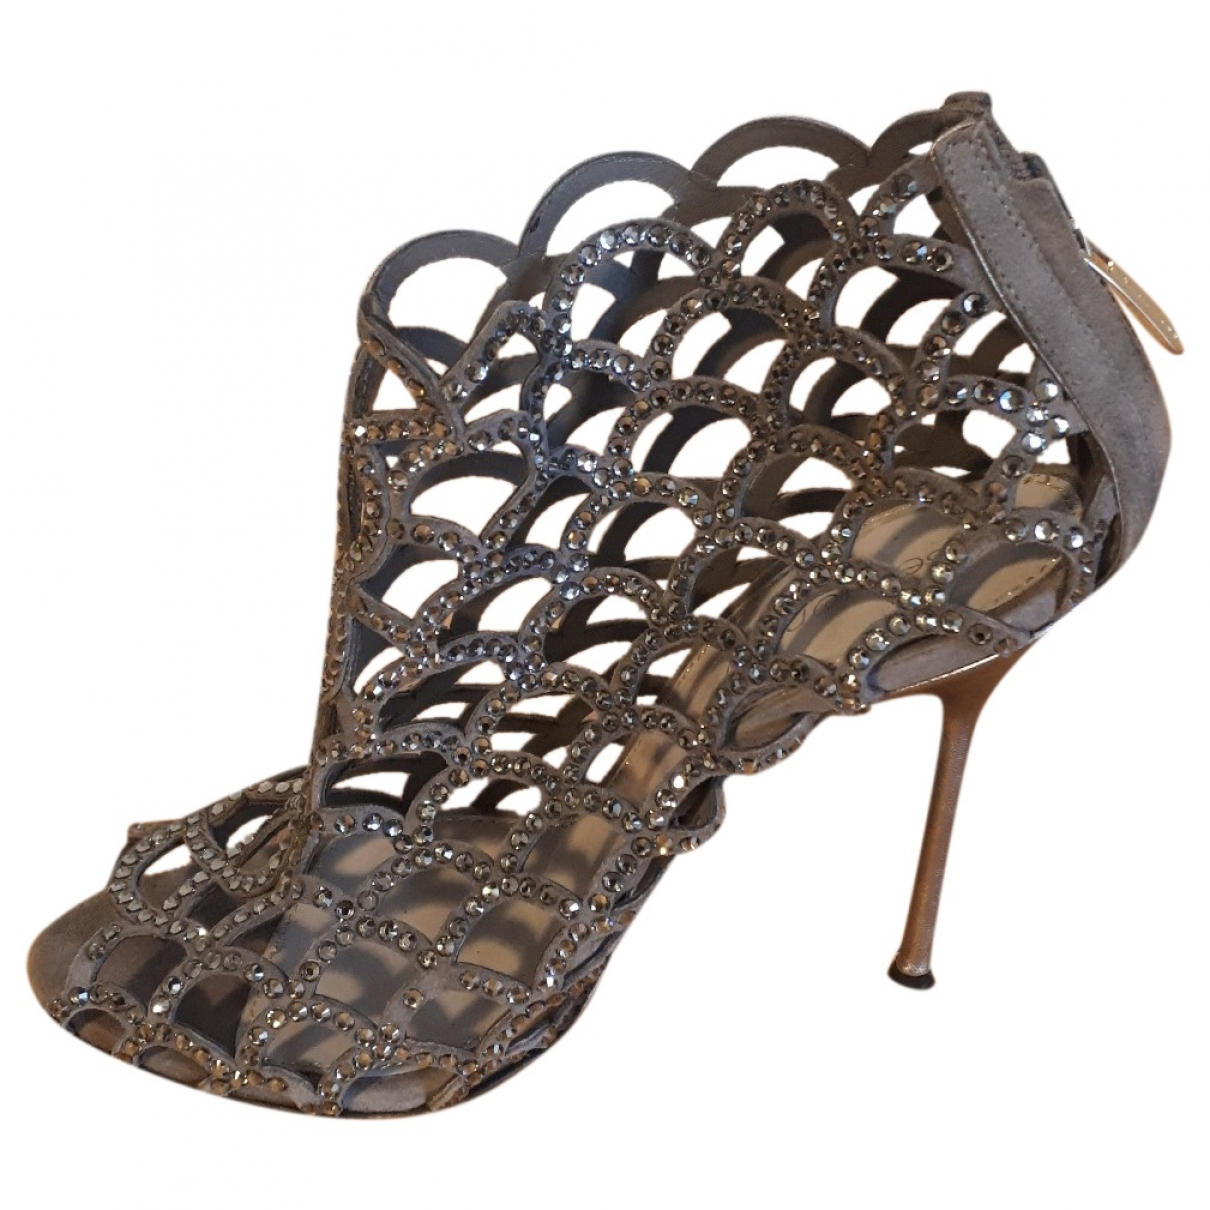 Sergio Rossi \N Grey Glitter Sandals for Women 39 EU